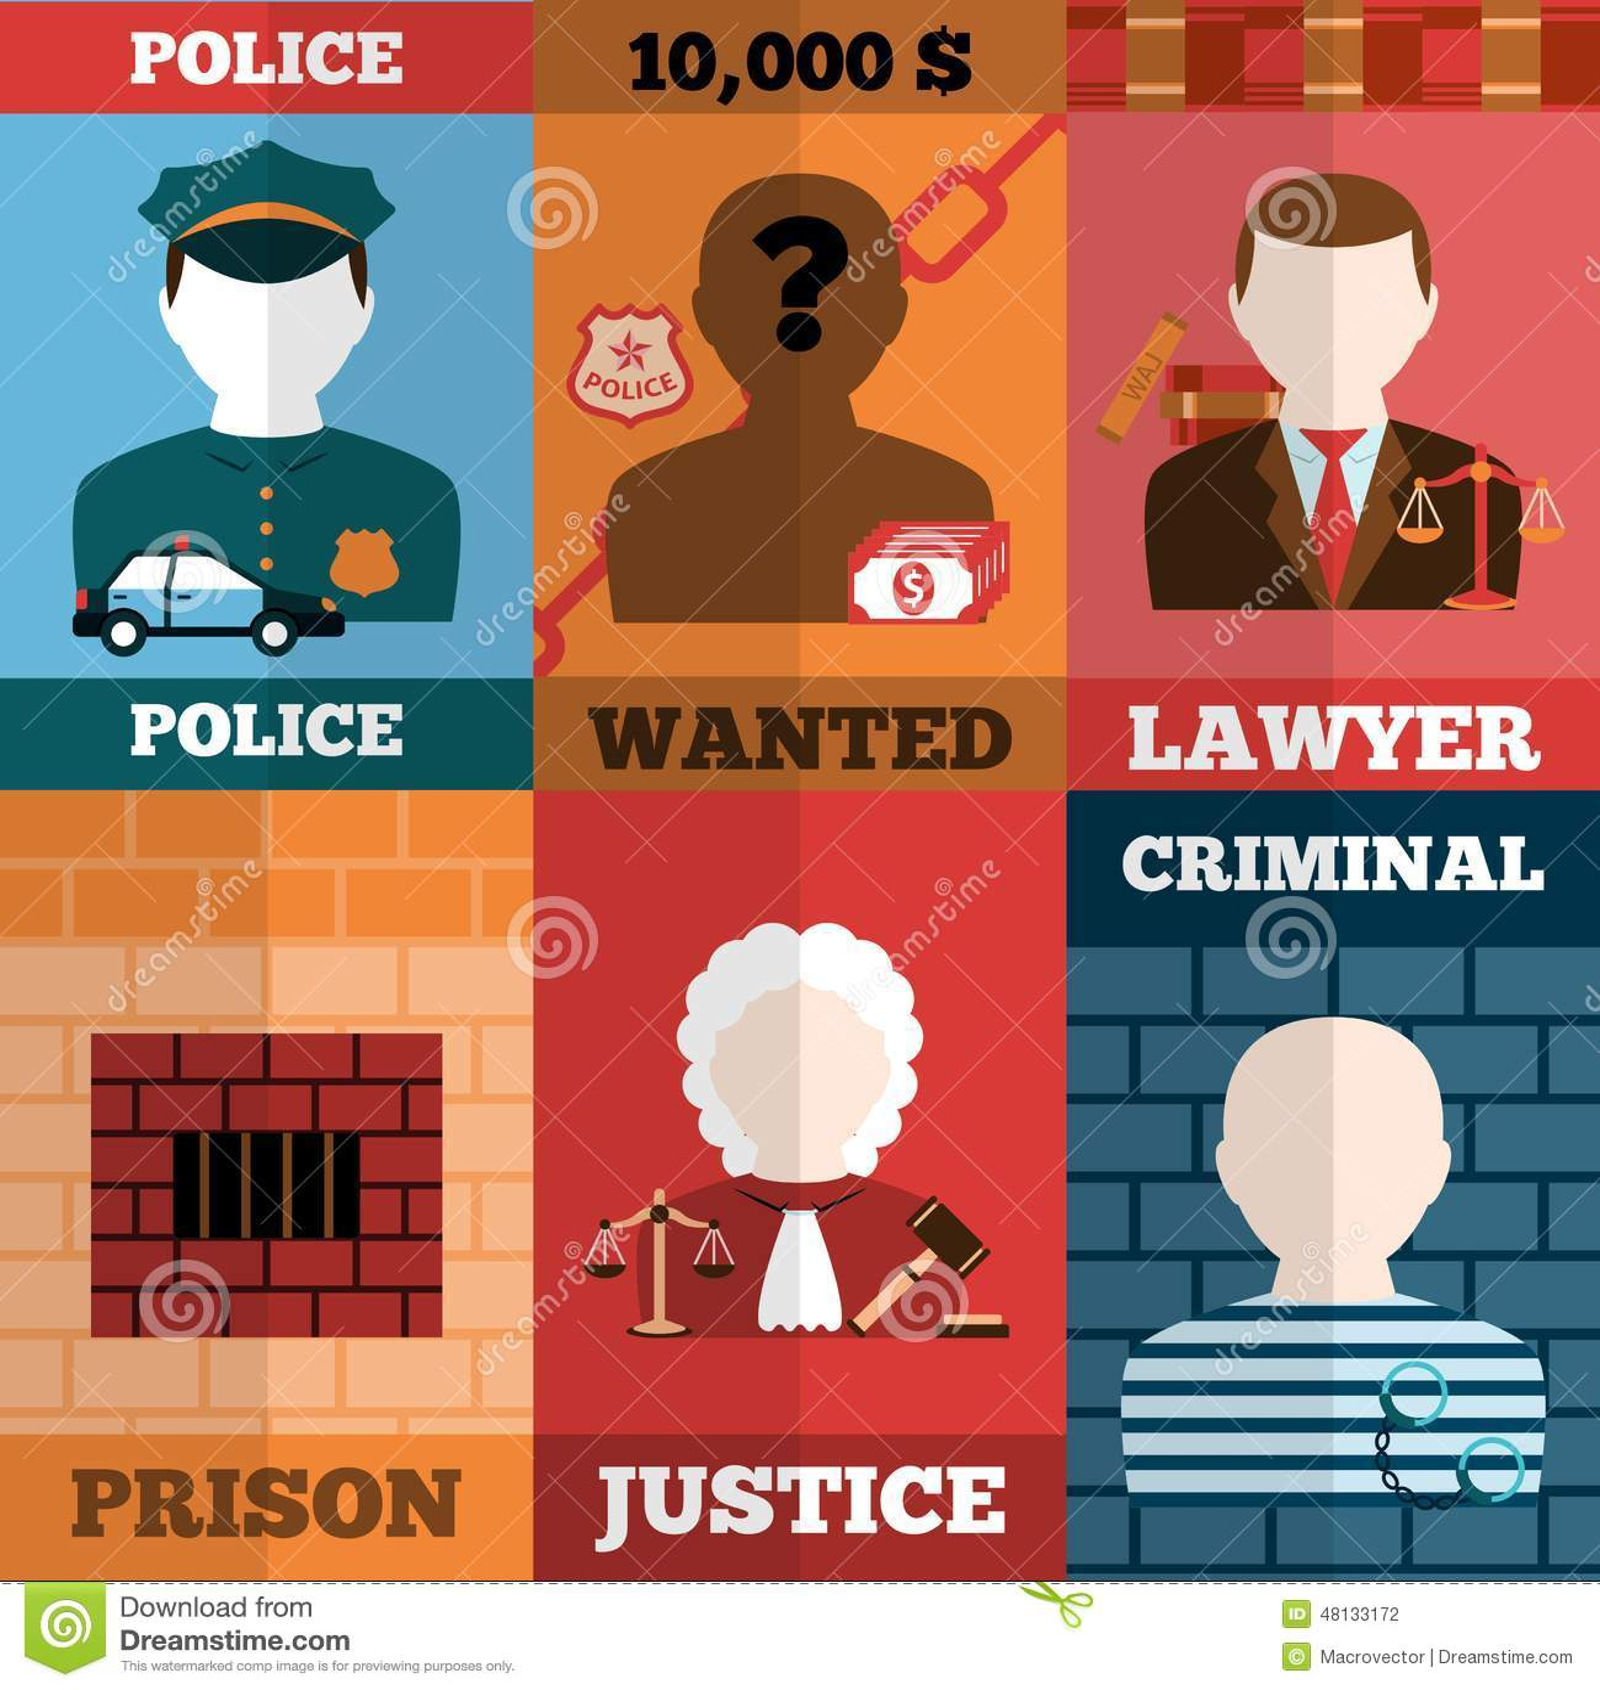 The Punishment Should Match the Criminal Essay